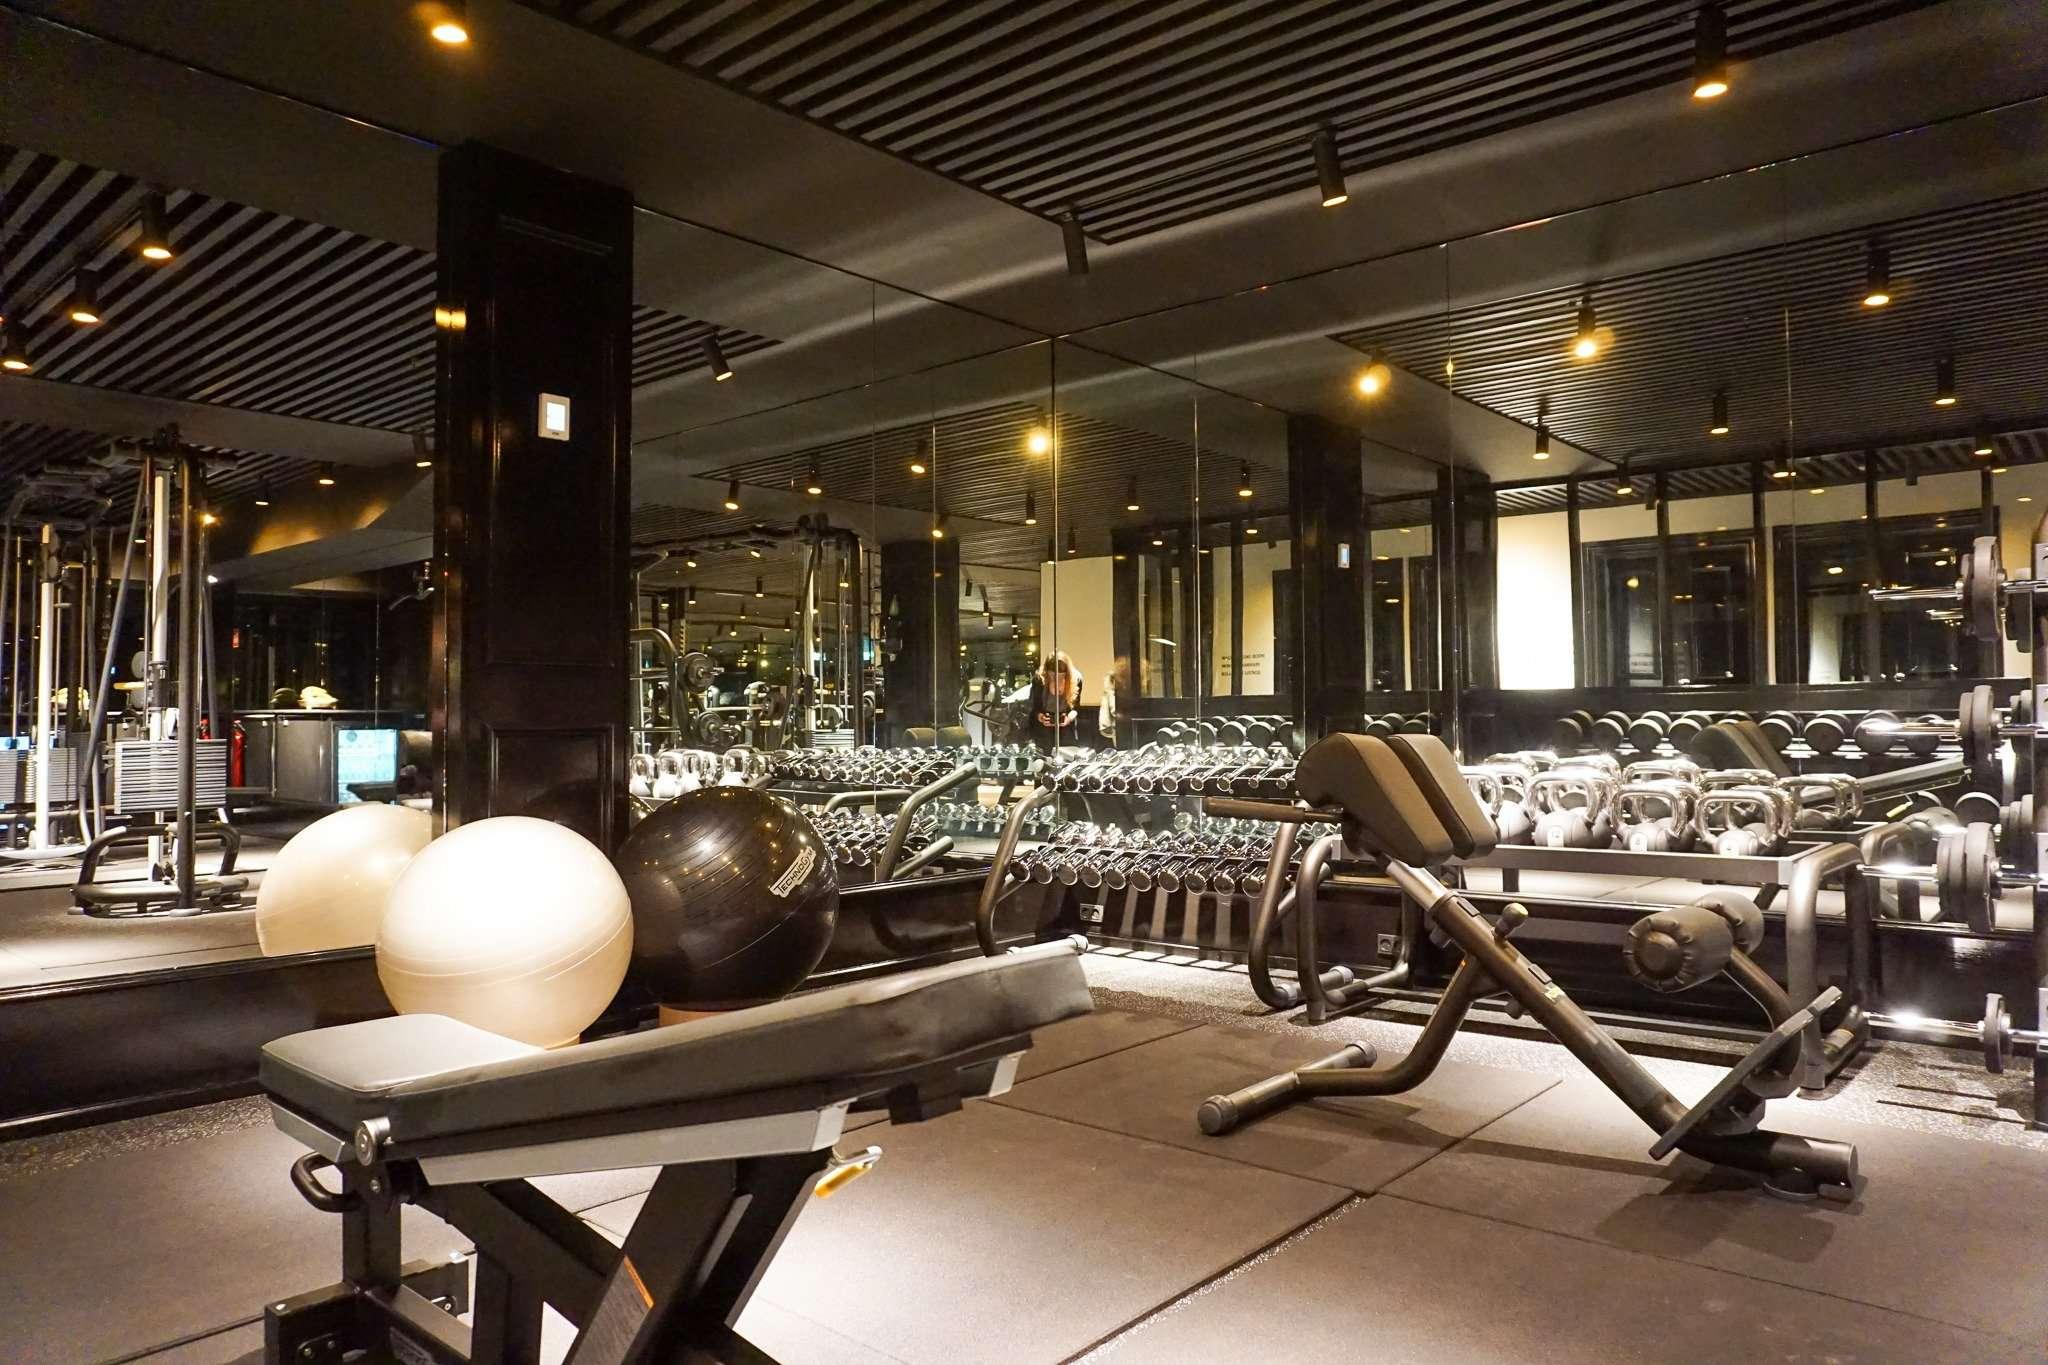 fully equipped gym at Nimb Hotel Copenhagen